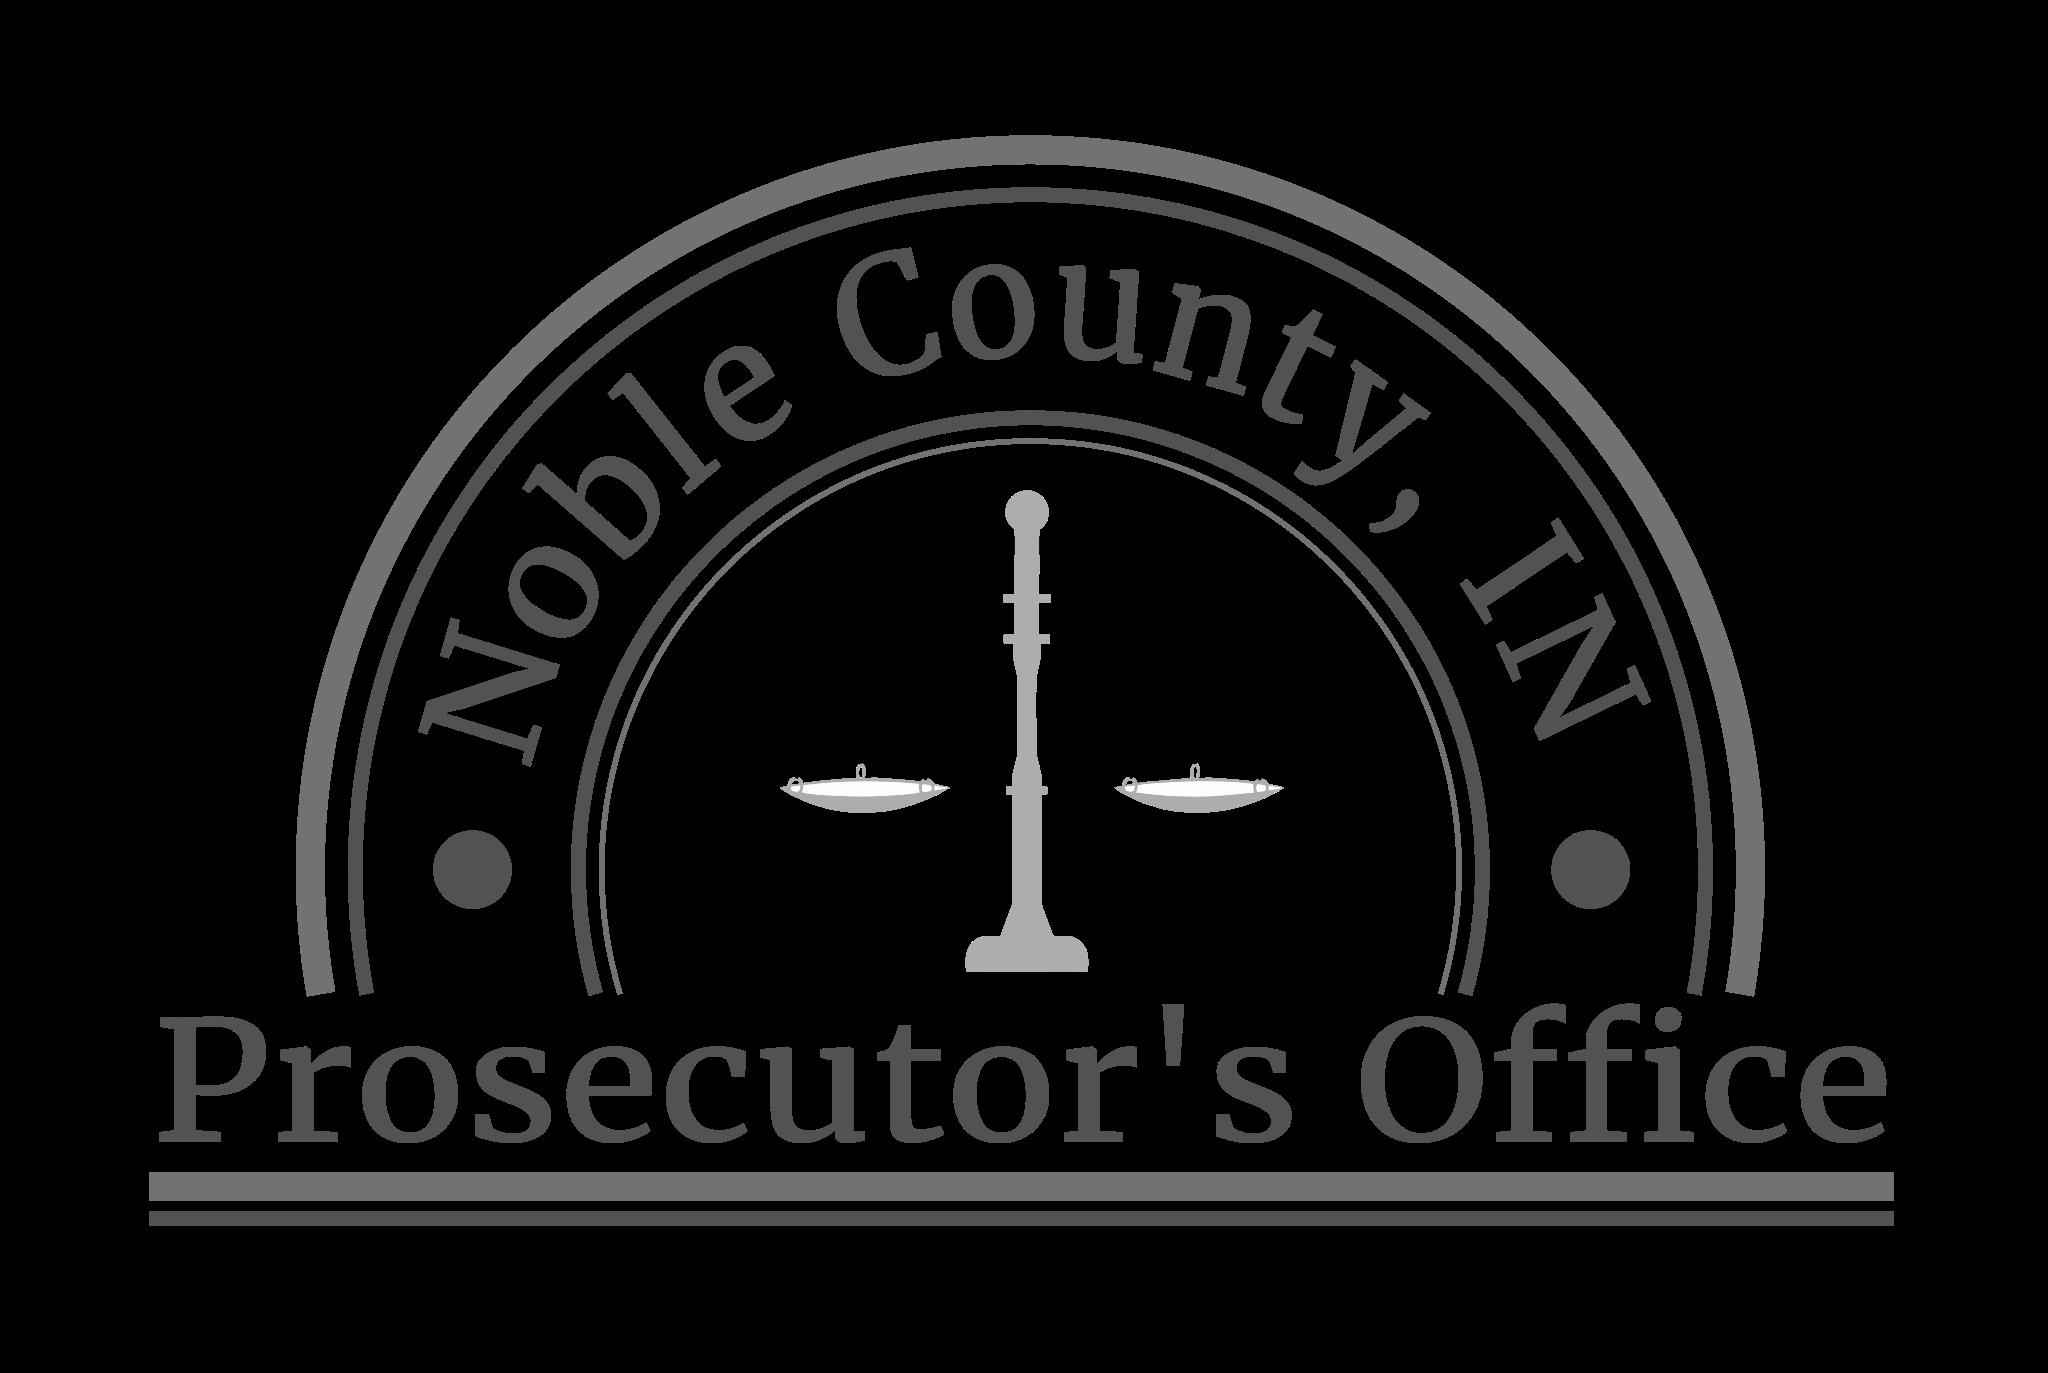 Noble County Prosecutor